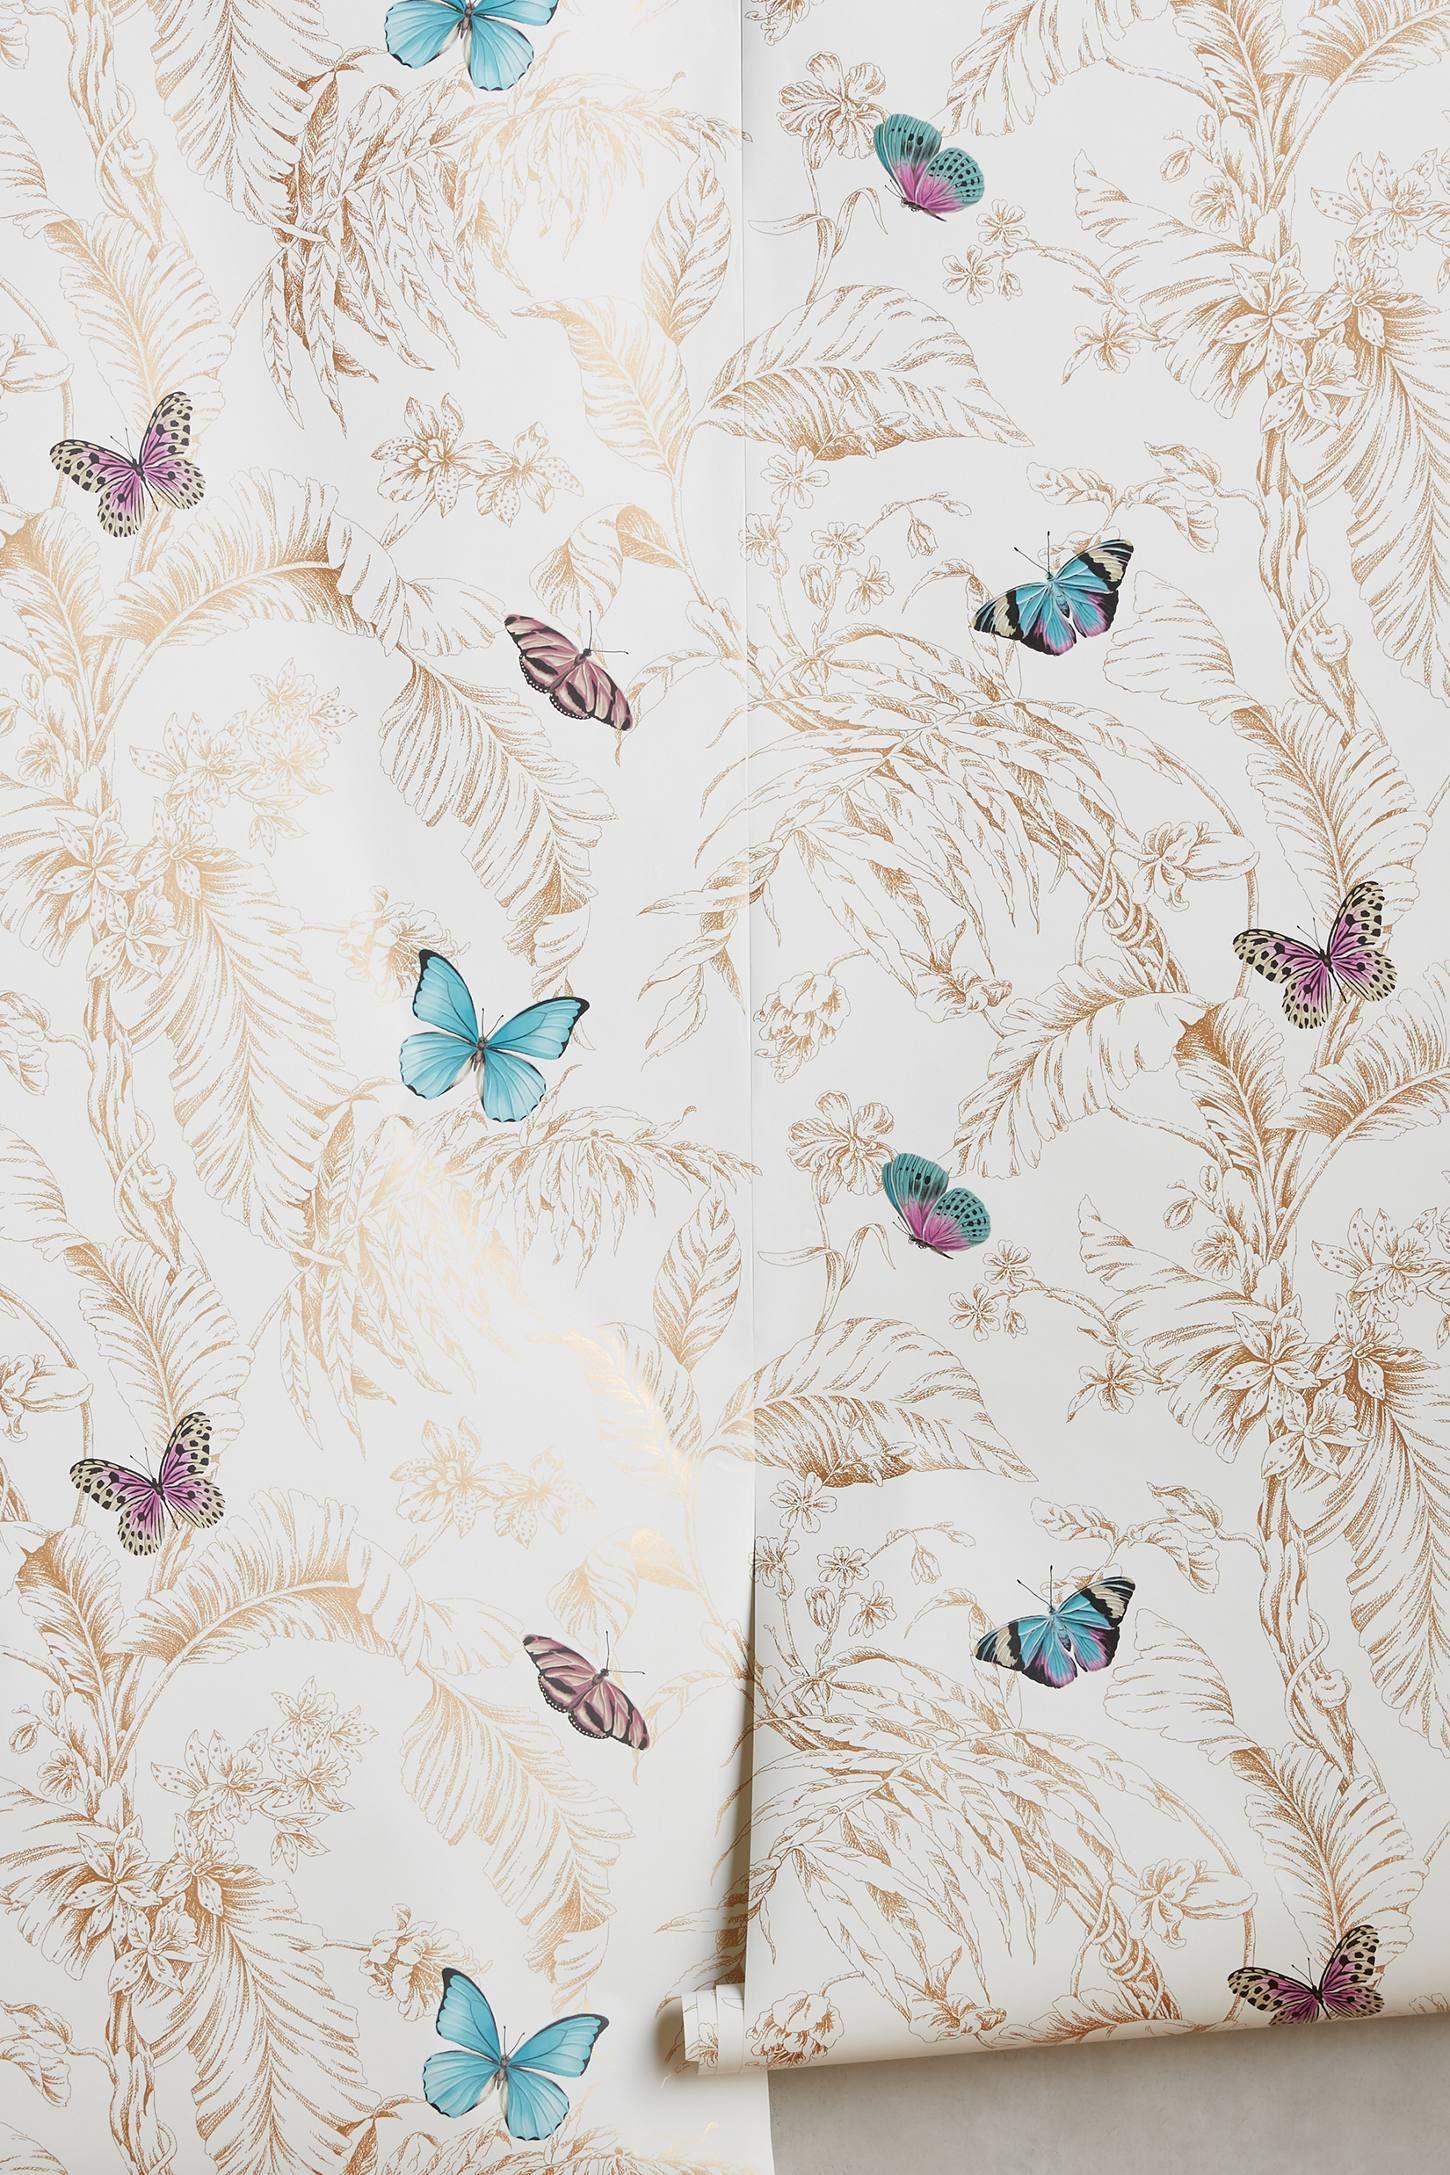 Papillon Wallpaper Anthropologie wallpaper, Wall decor